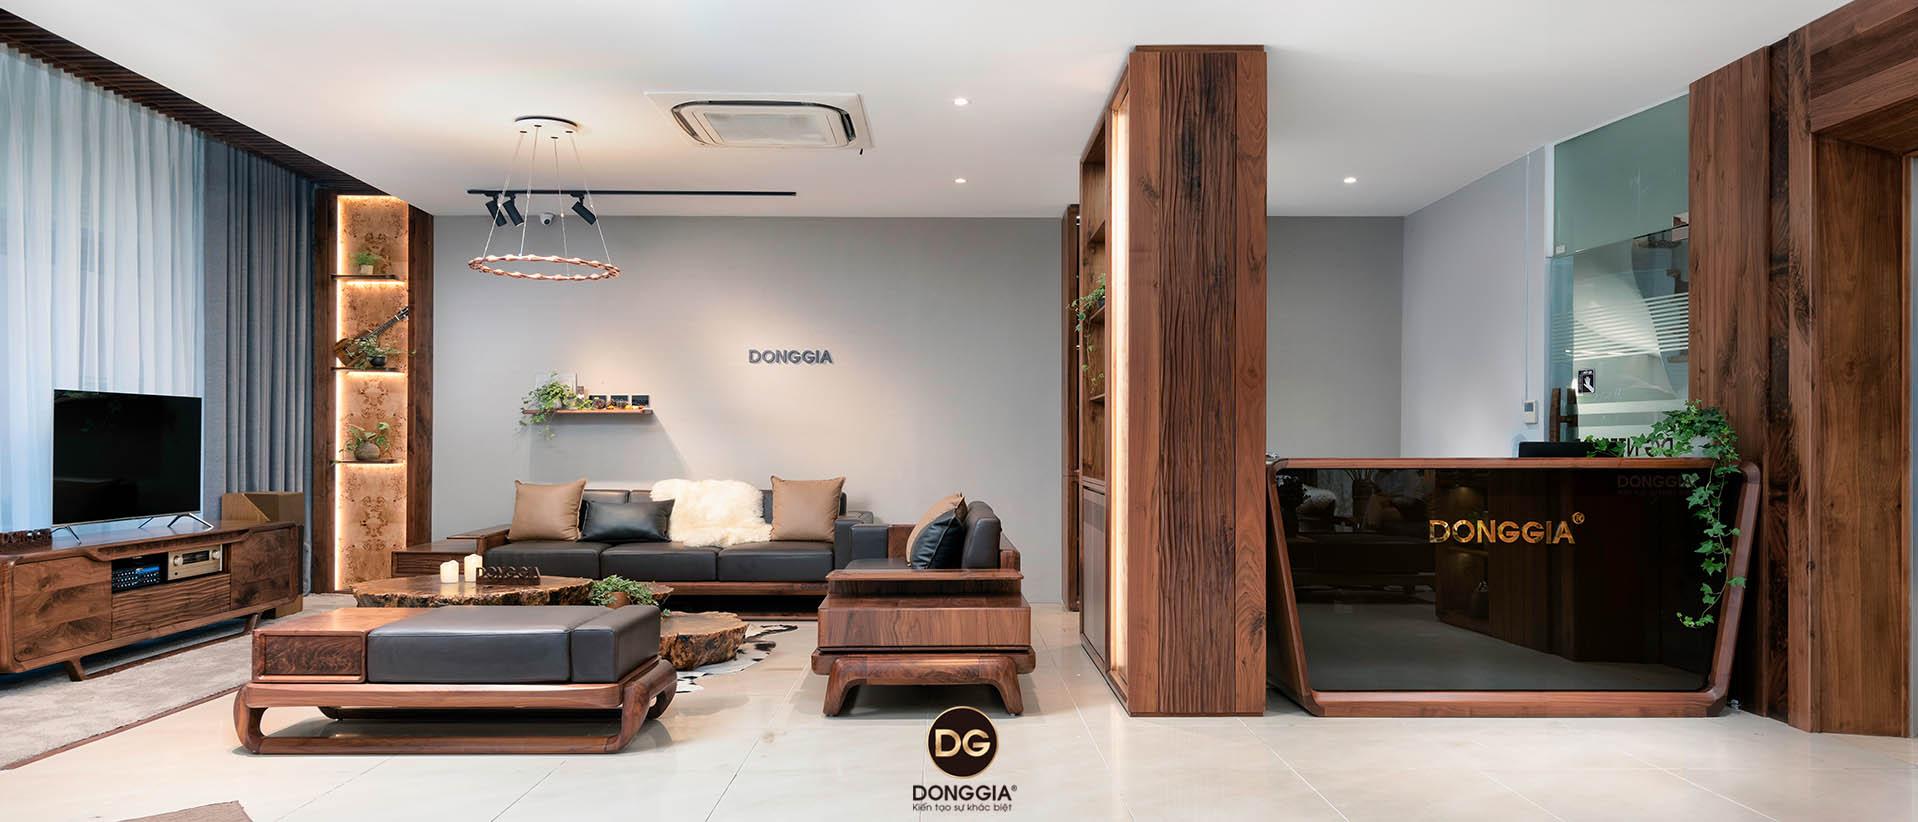 showroom-noi-that-dg-vip-2020 (3)